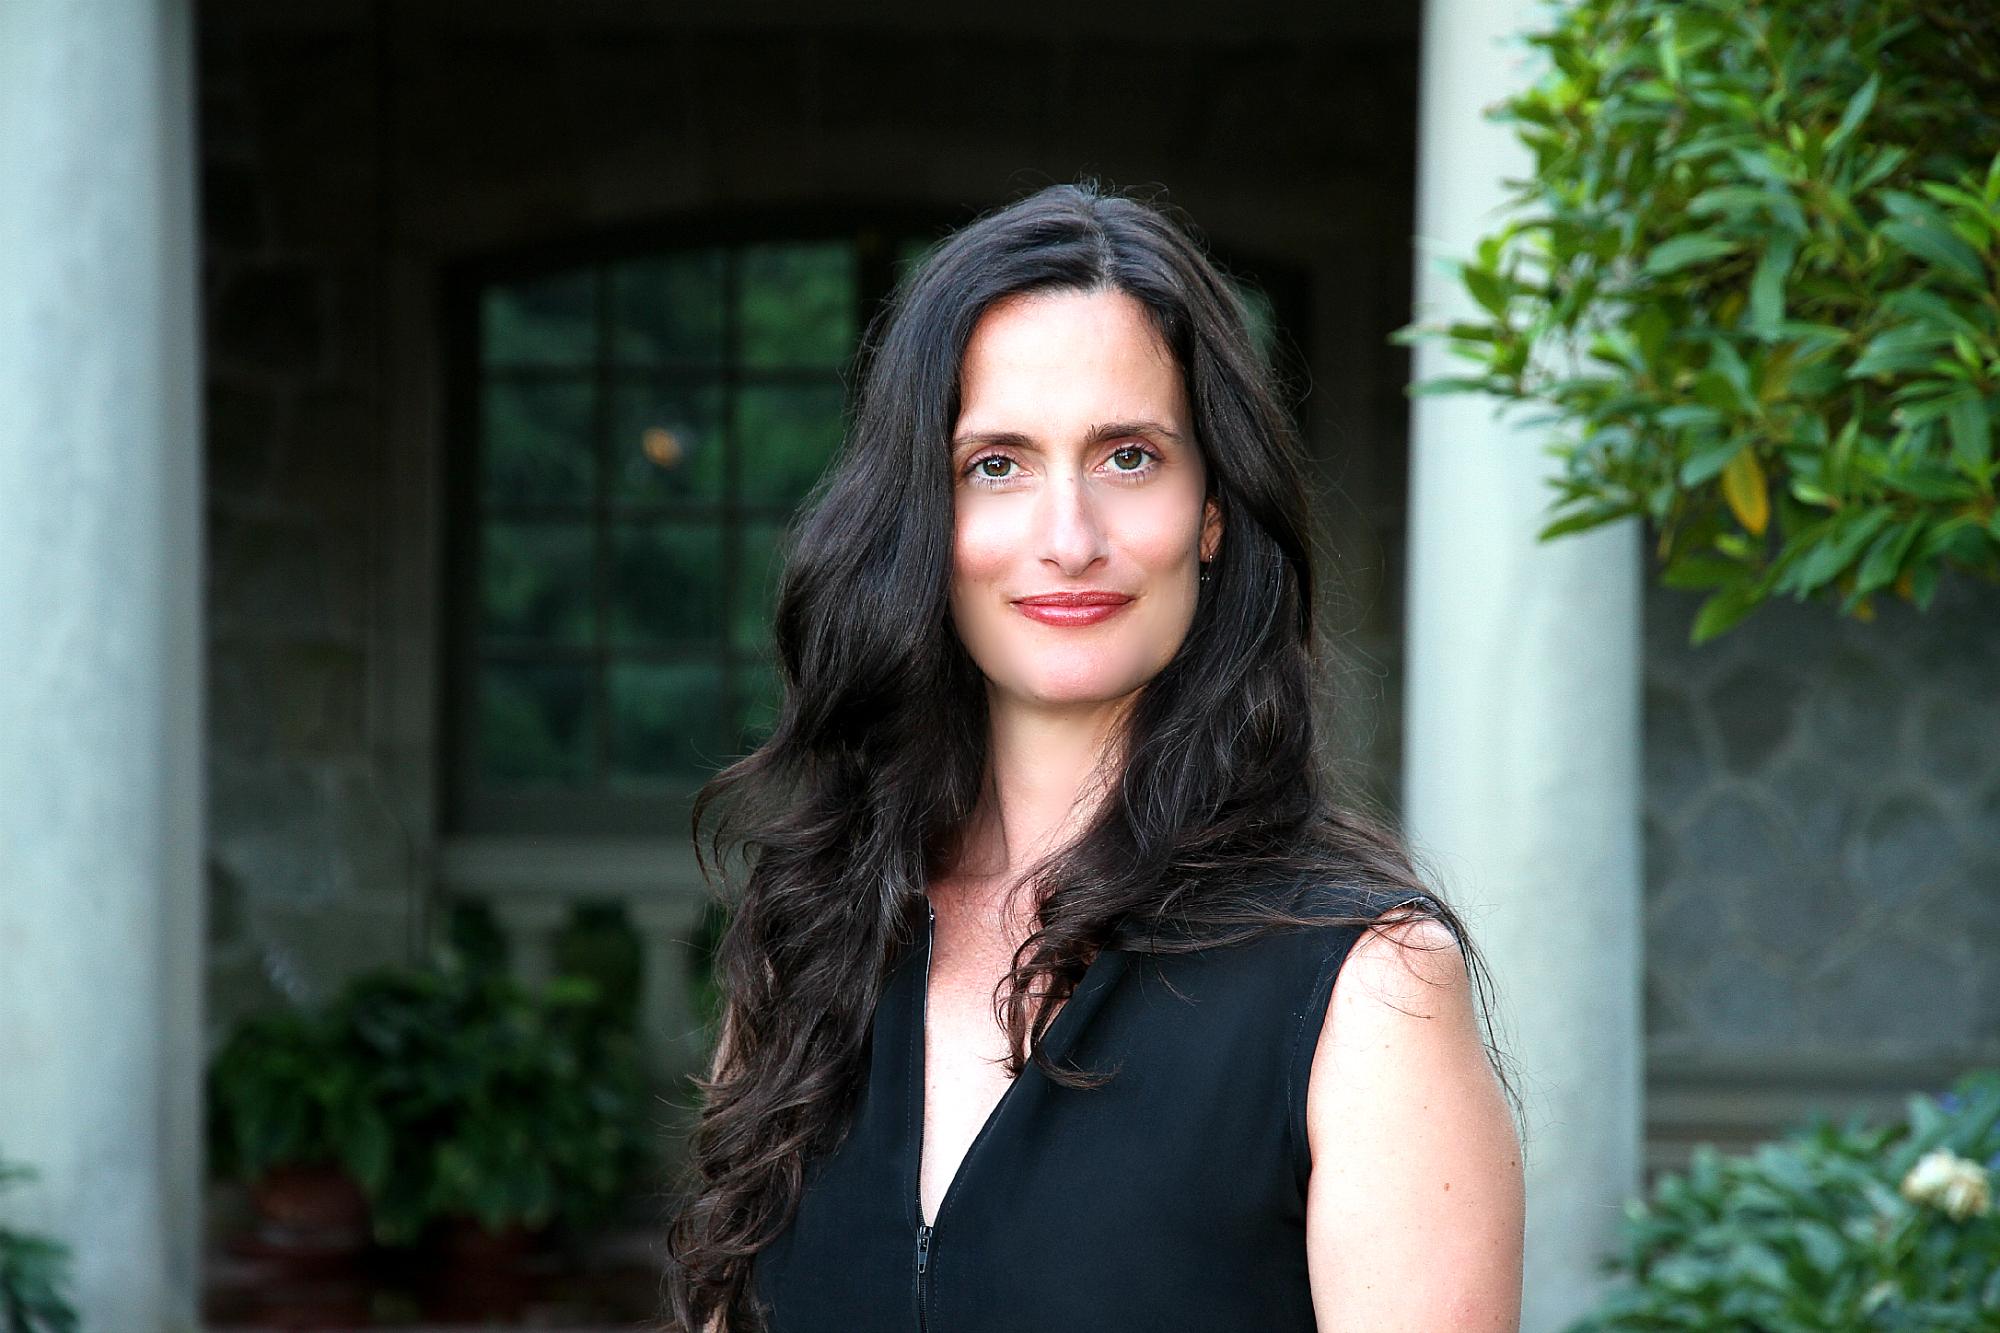 Patricia Kathryn Galaczy, B.A., M.I.R., Director, The Art Of Dialogue